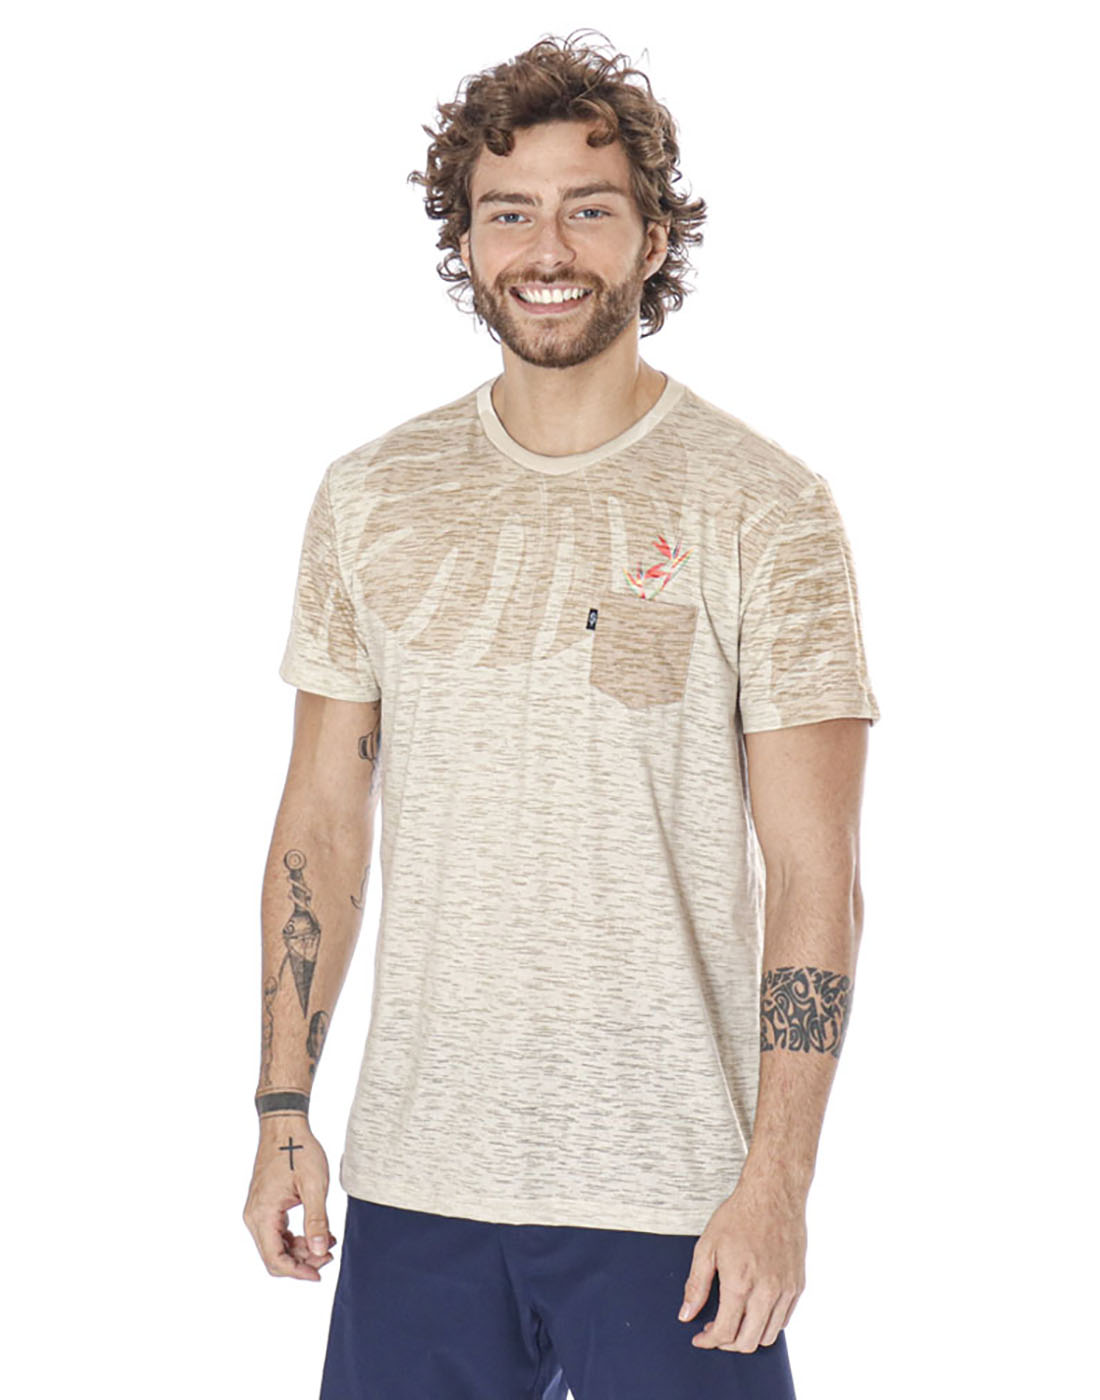 Camiseta Dif Estrelicia Preto Pena